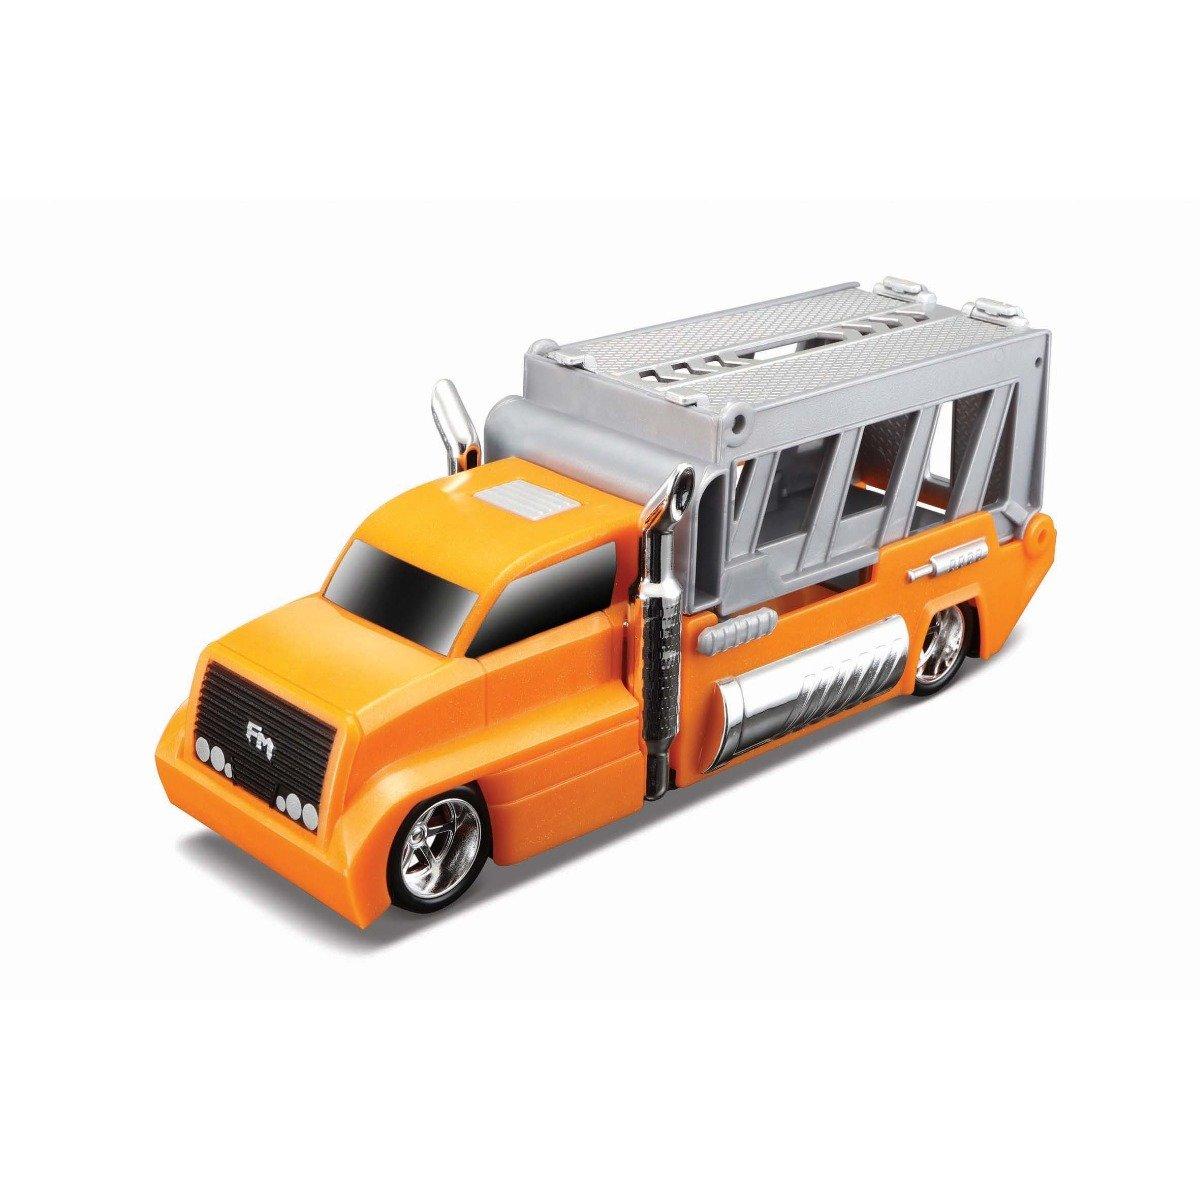 Set masinuta, camion si cheie Maisto, Portocaliu